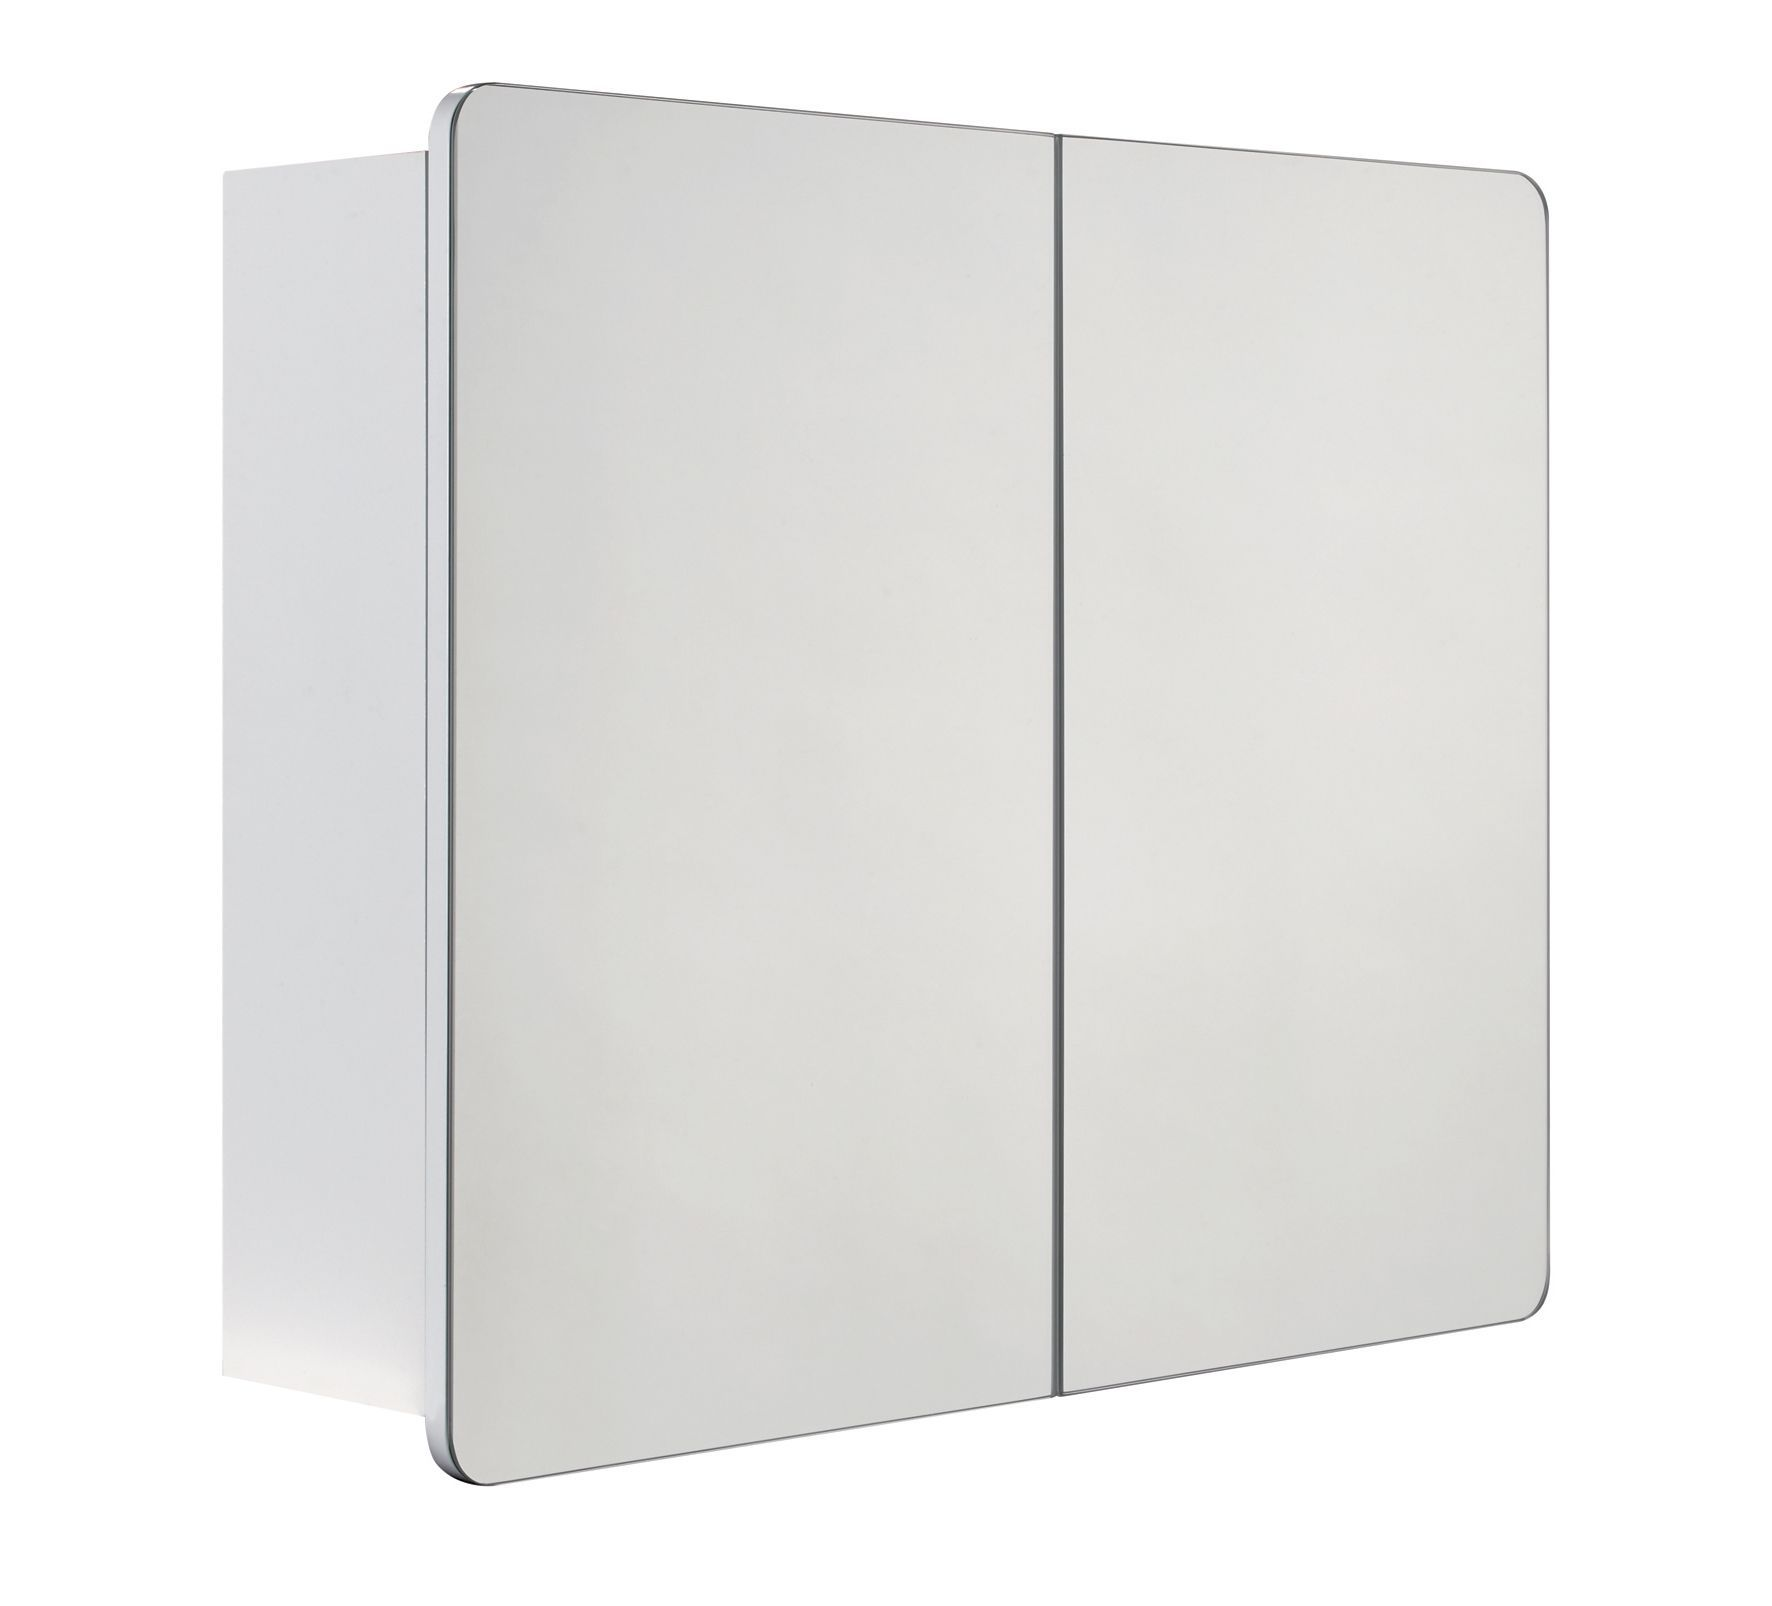 cooke lewis lesina double door white mirror cabinet